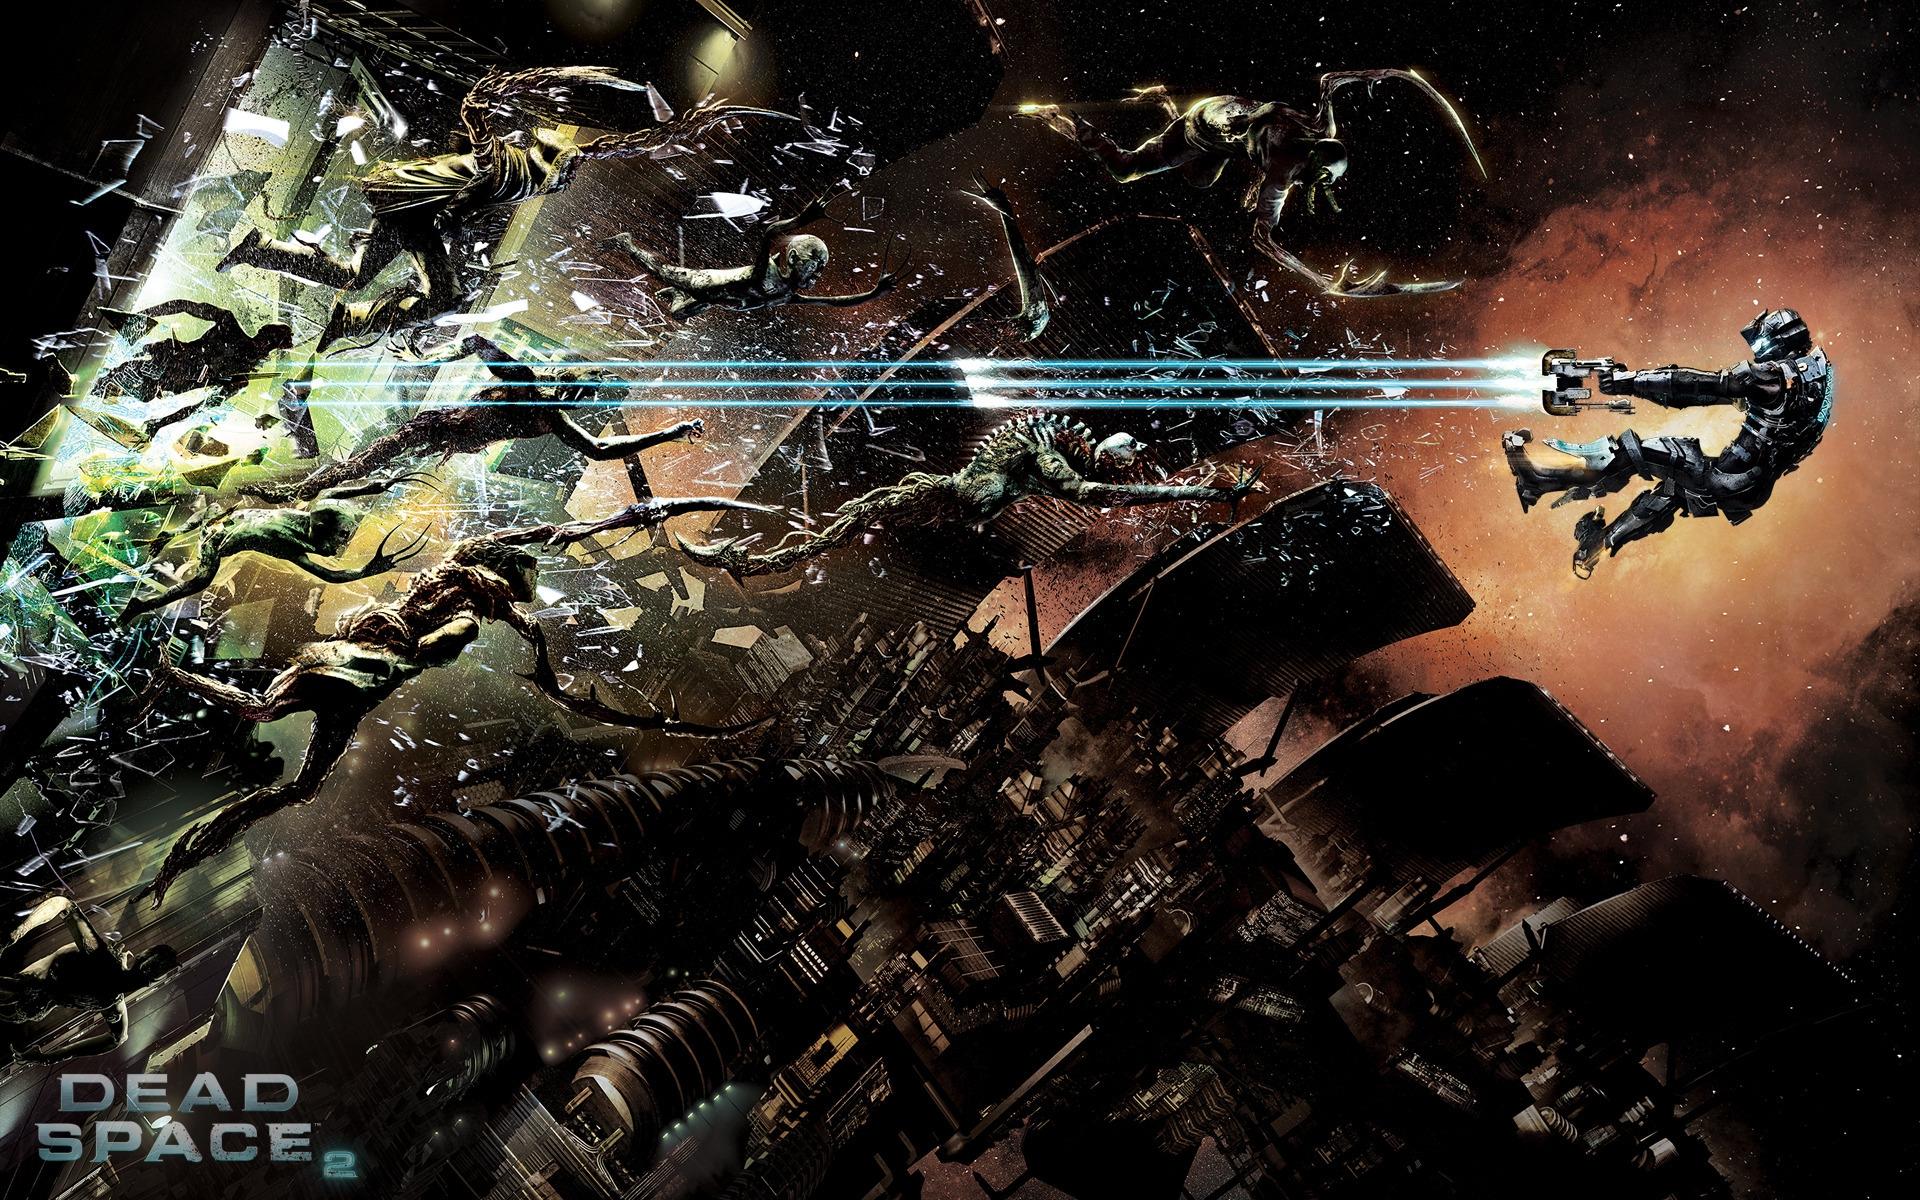 космос - Dead Space 2 Айзек, Некроморф